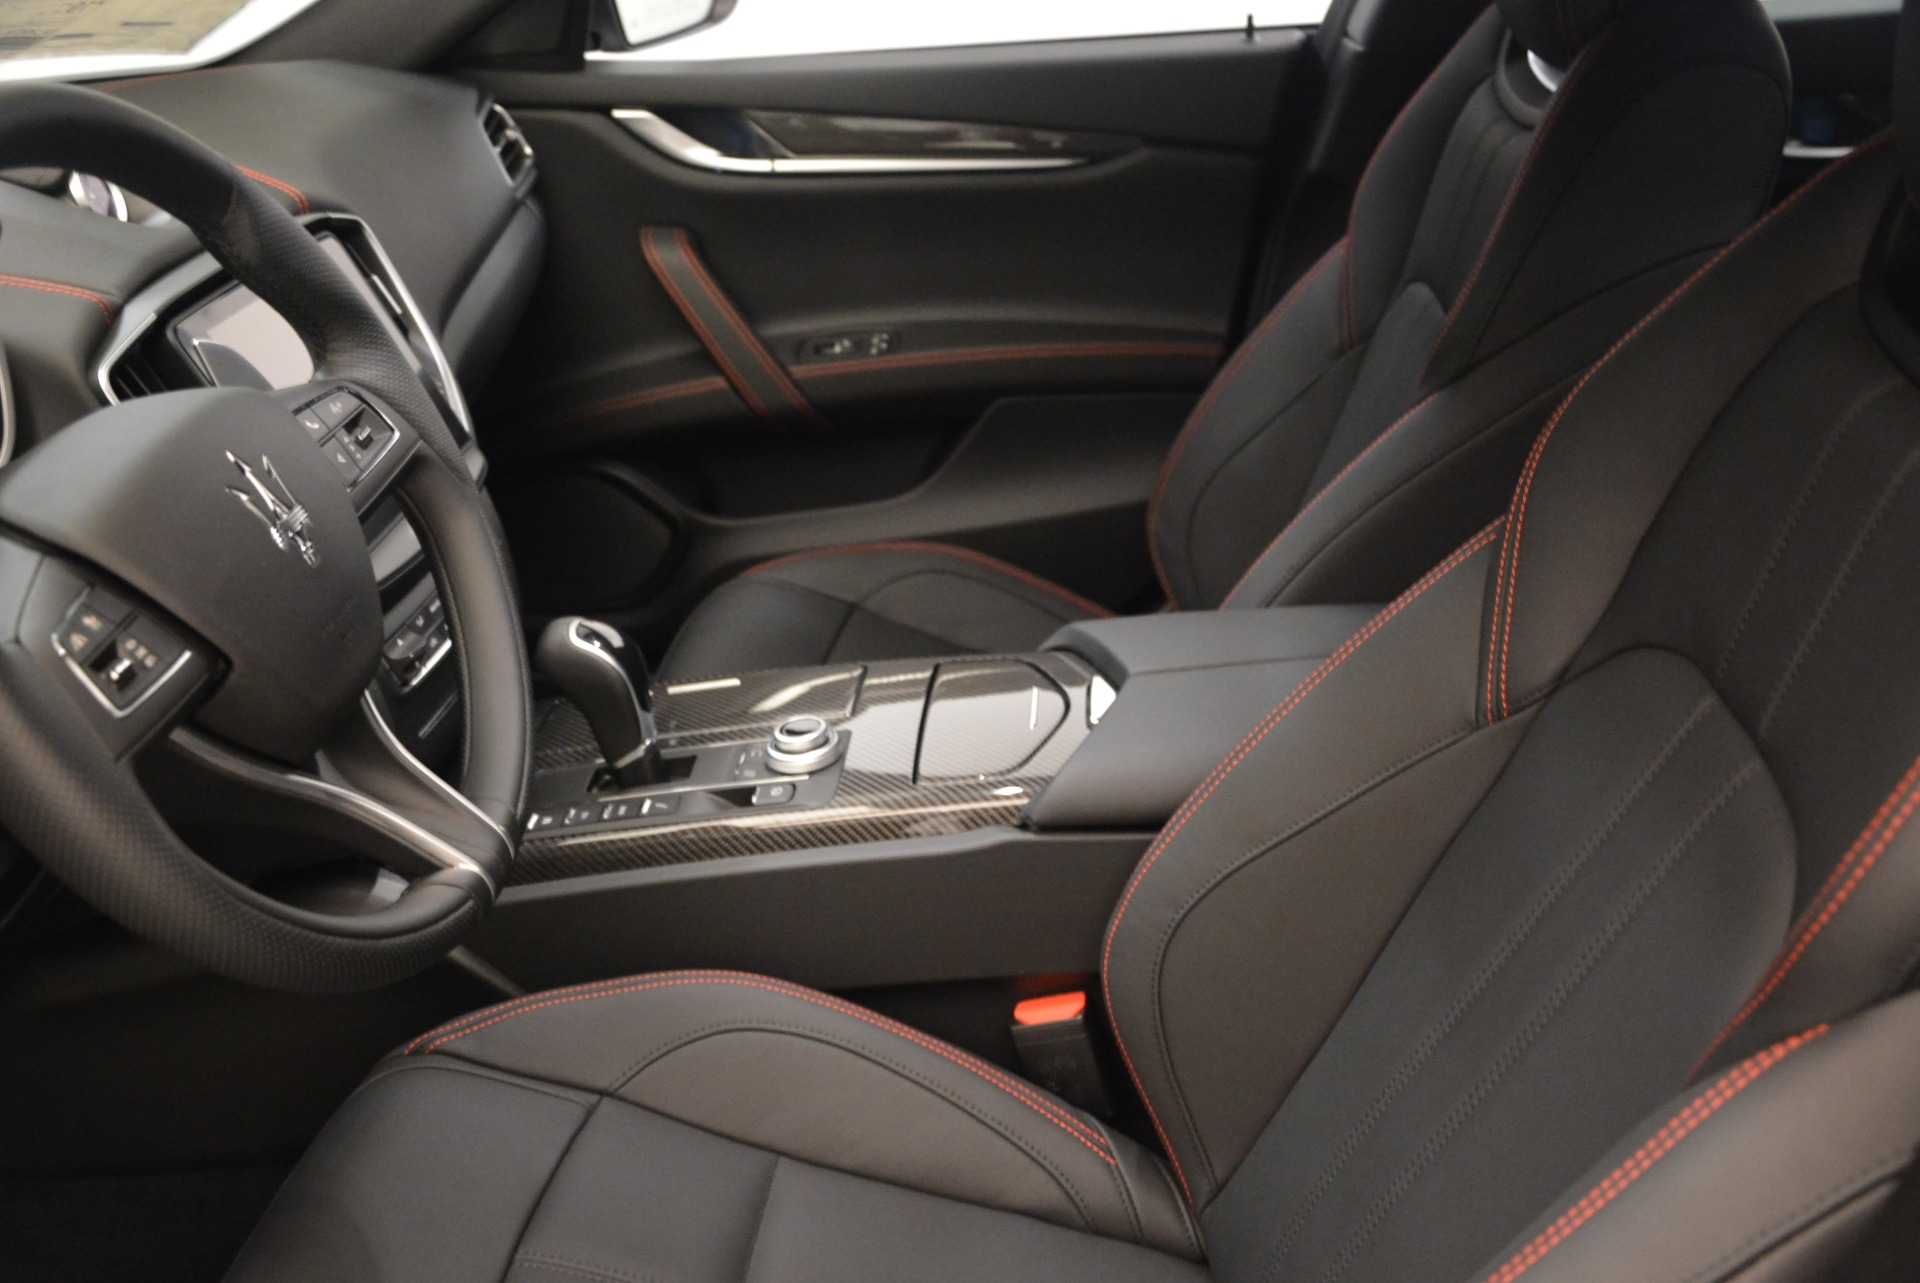 New 2018 Maserati Ghibli SQ4 GranSport Nerissimo For Sale In Westport, CT 2368_p14